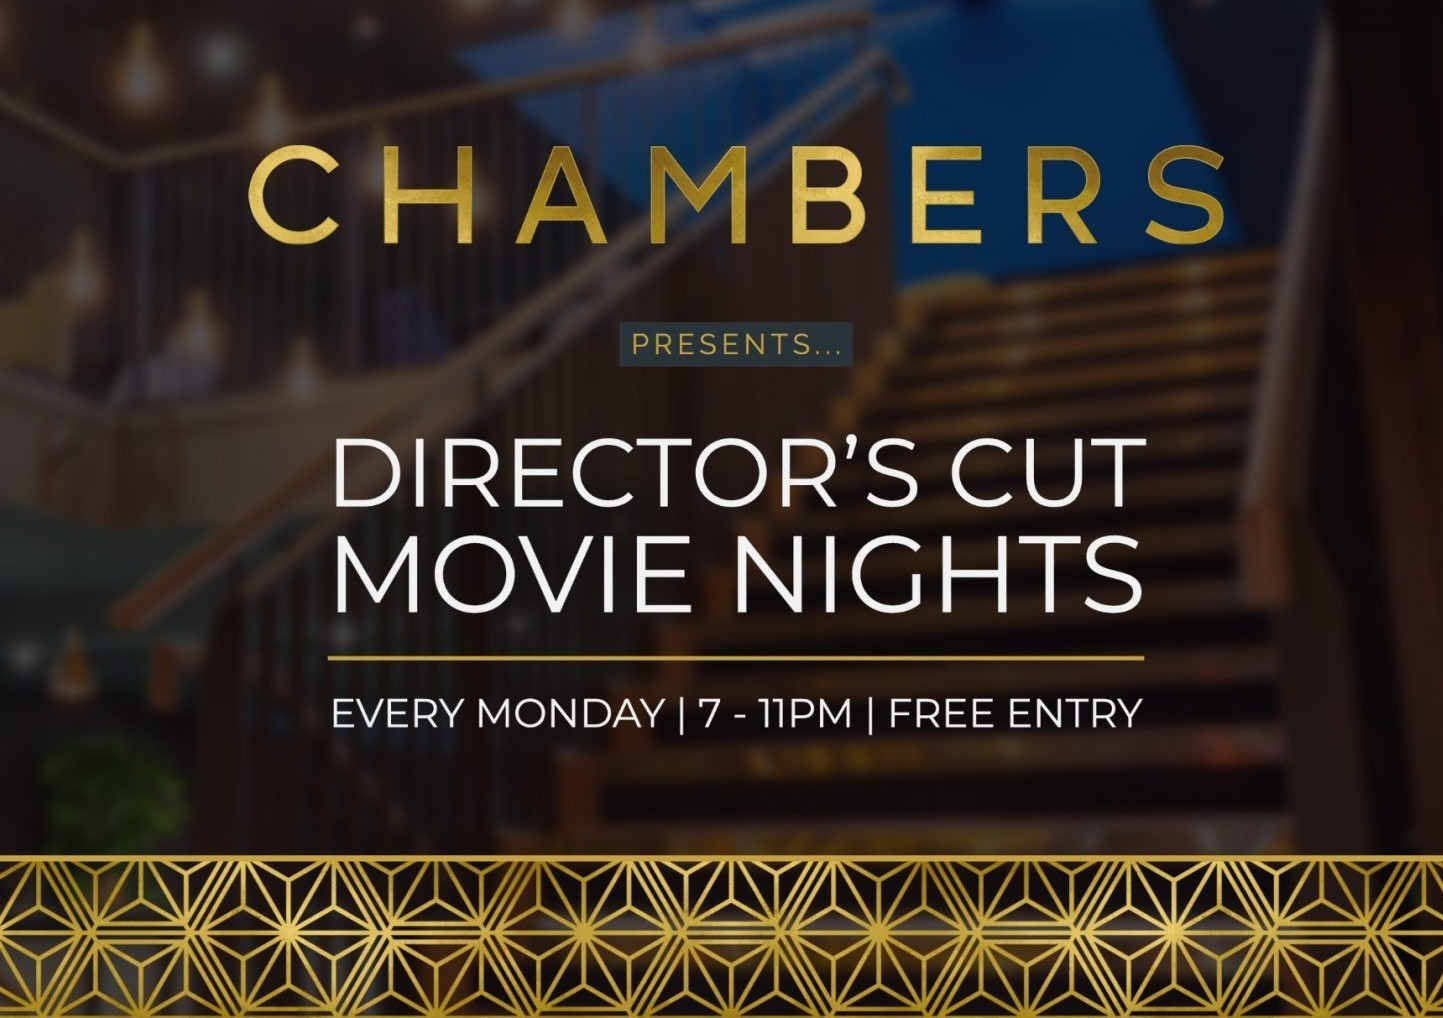 Director's Cut Movie Night